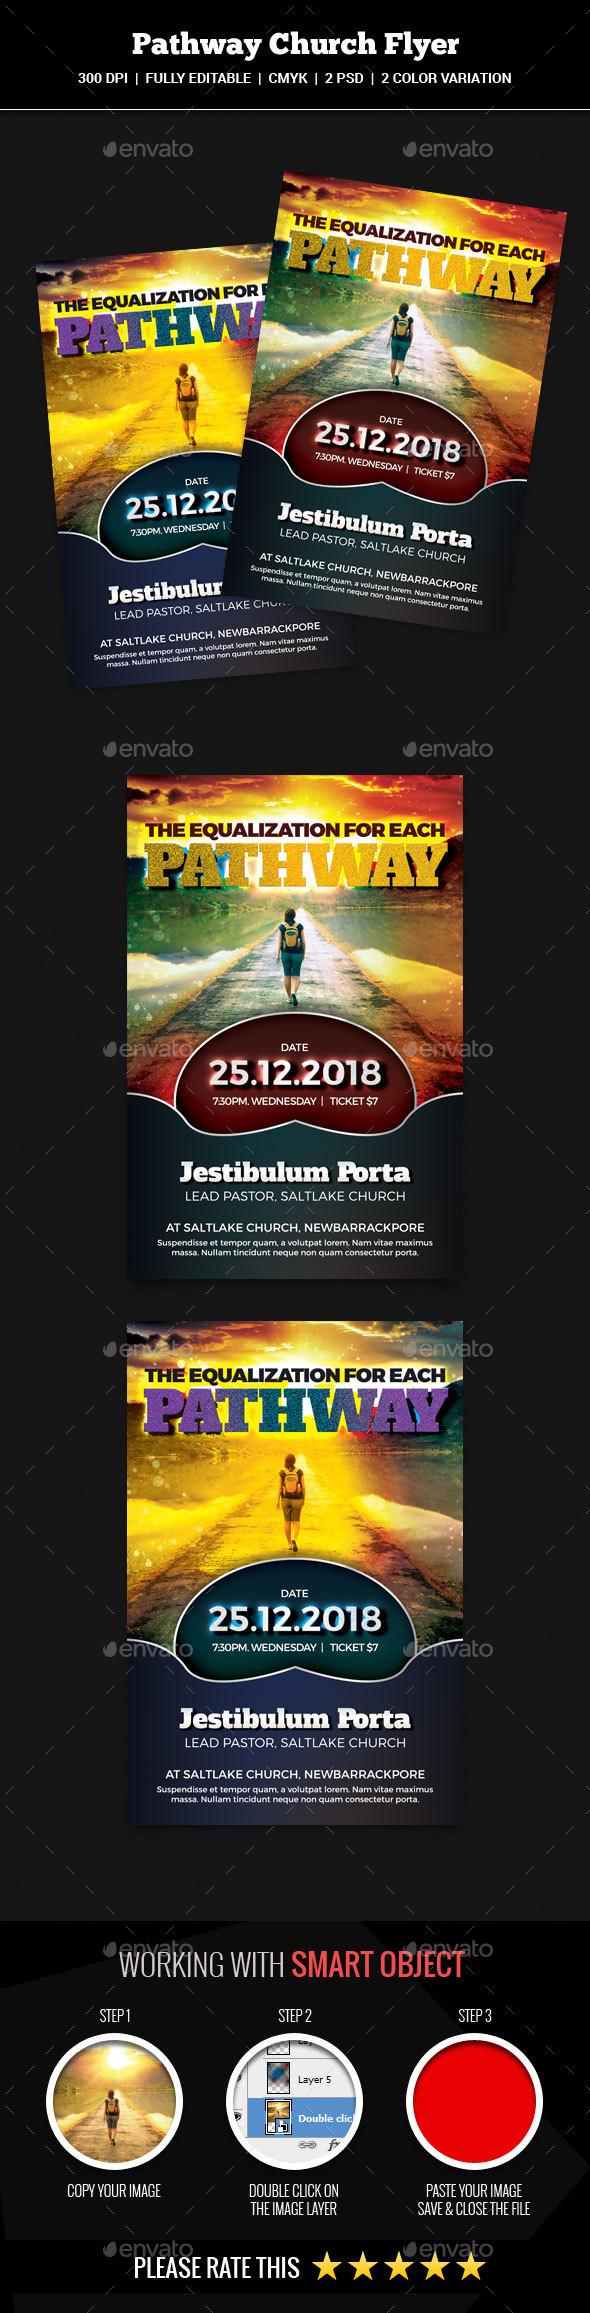 Pathway Church Flyer - Church Flyers